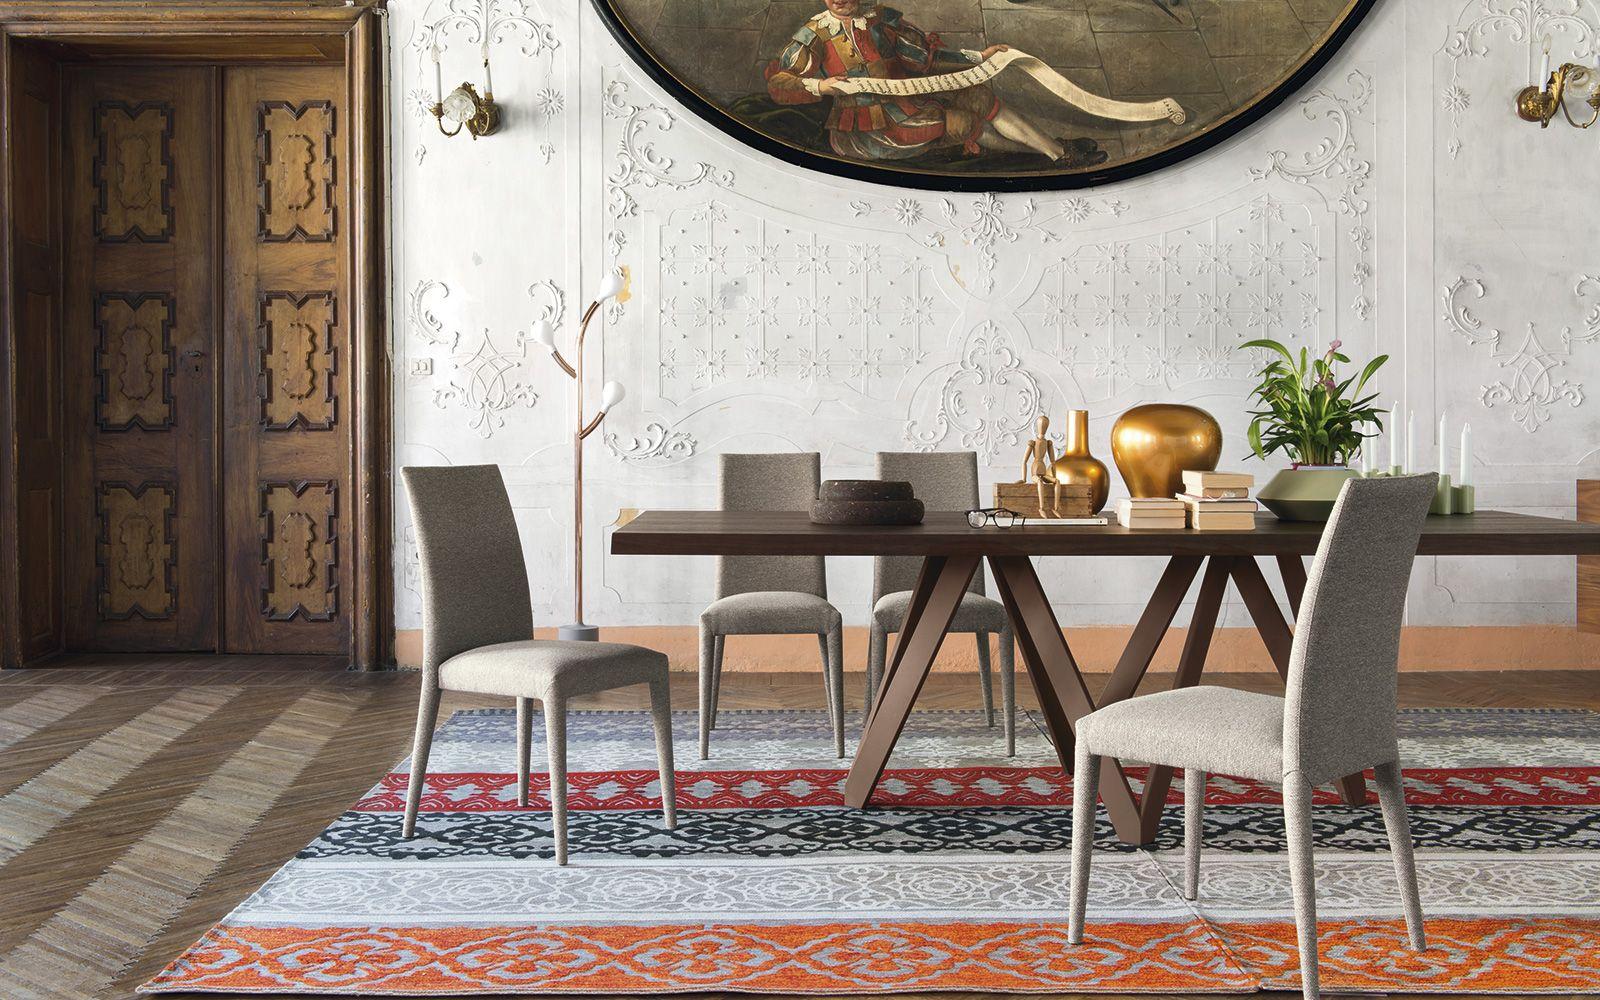 Sedie Rosse Calligaris : Sedia anais di calligaris sedie moderne nel